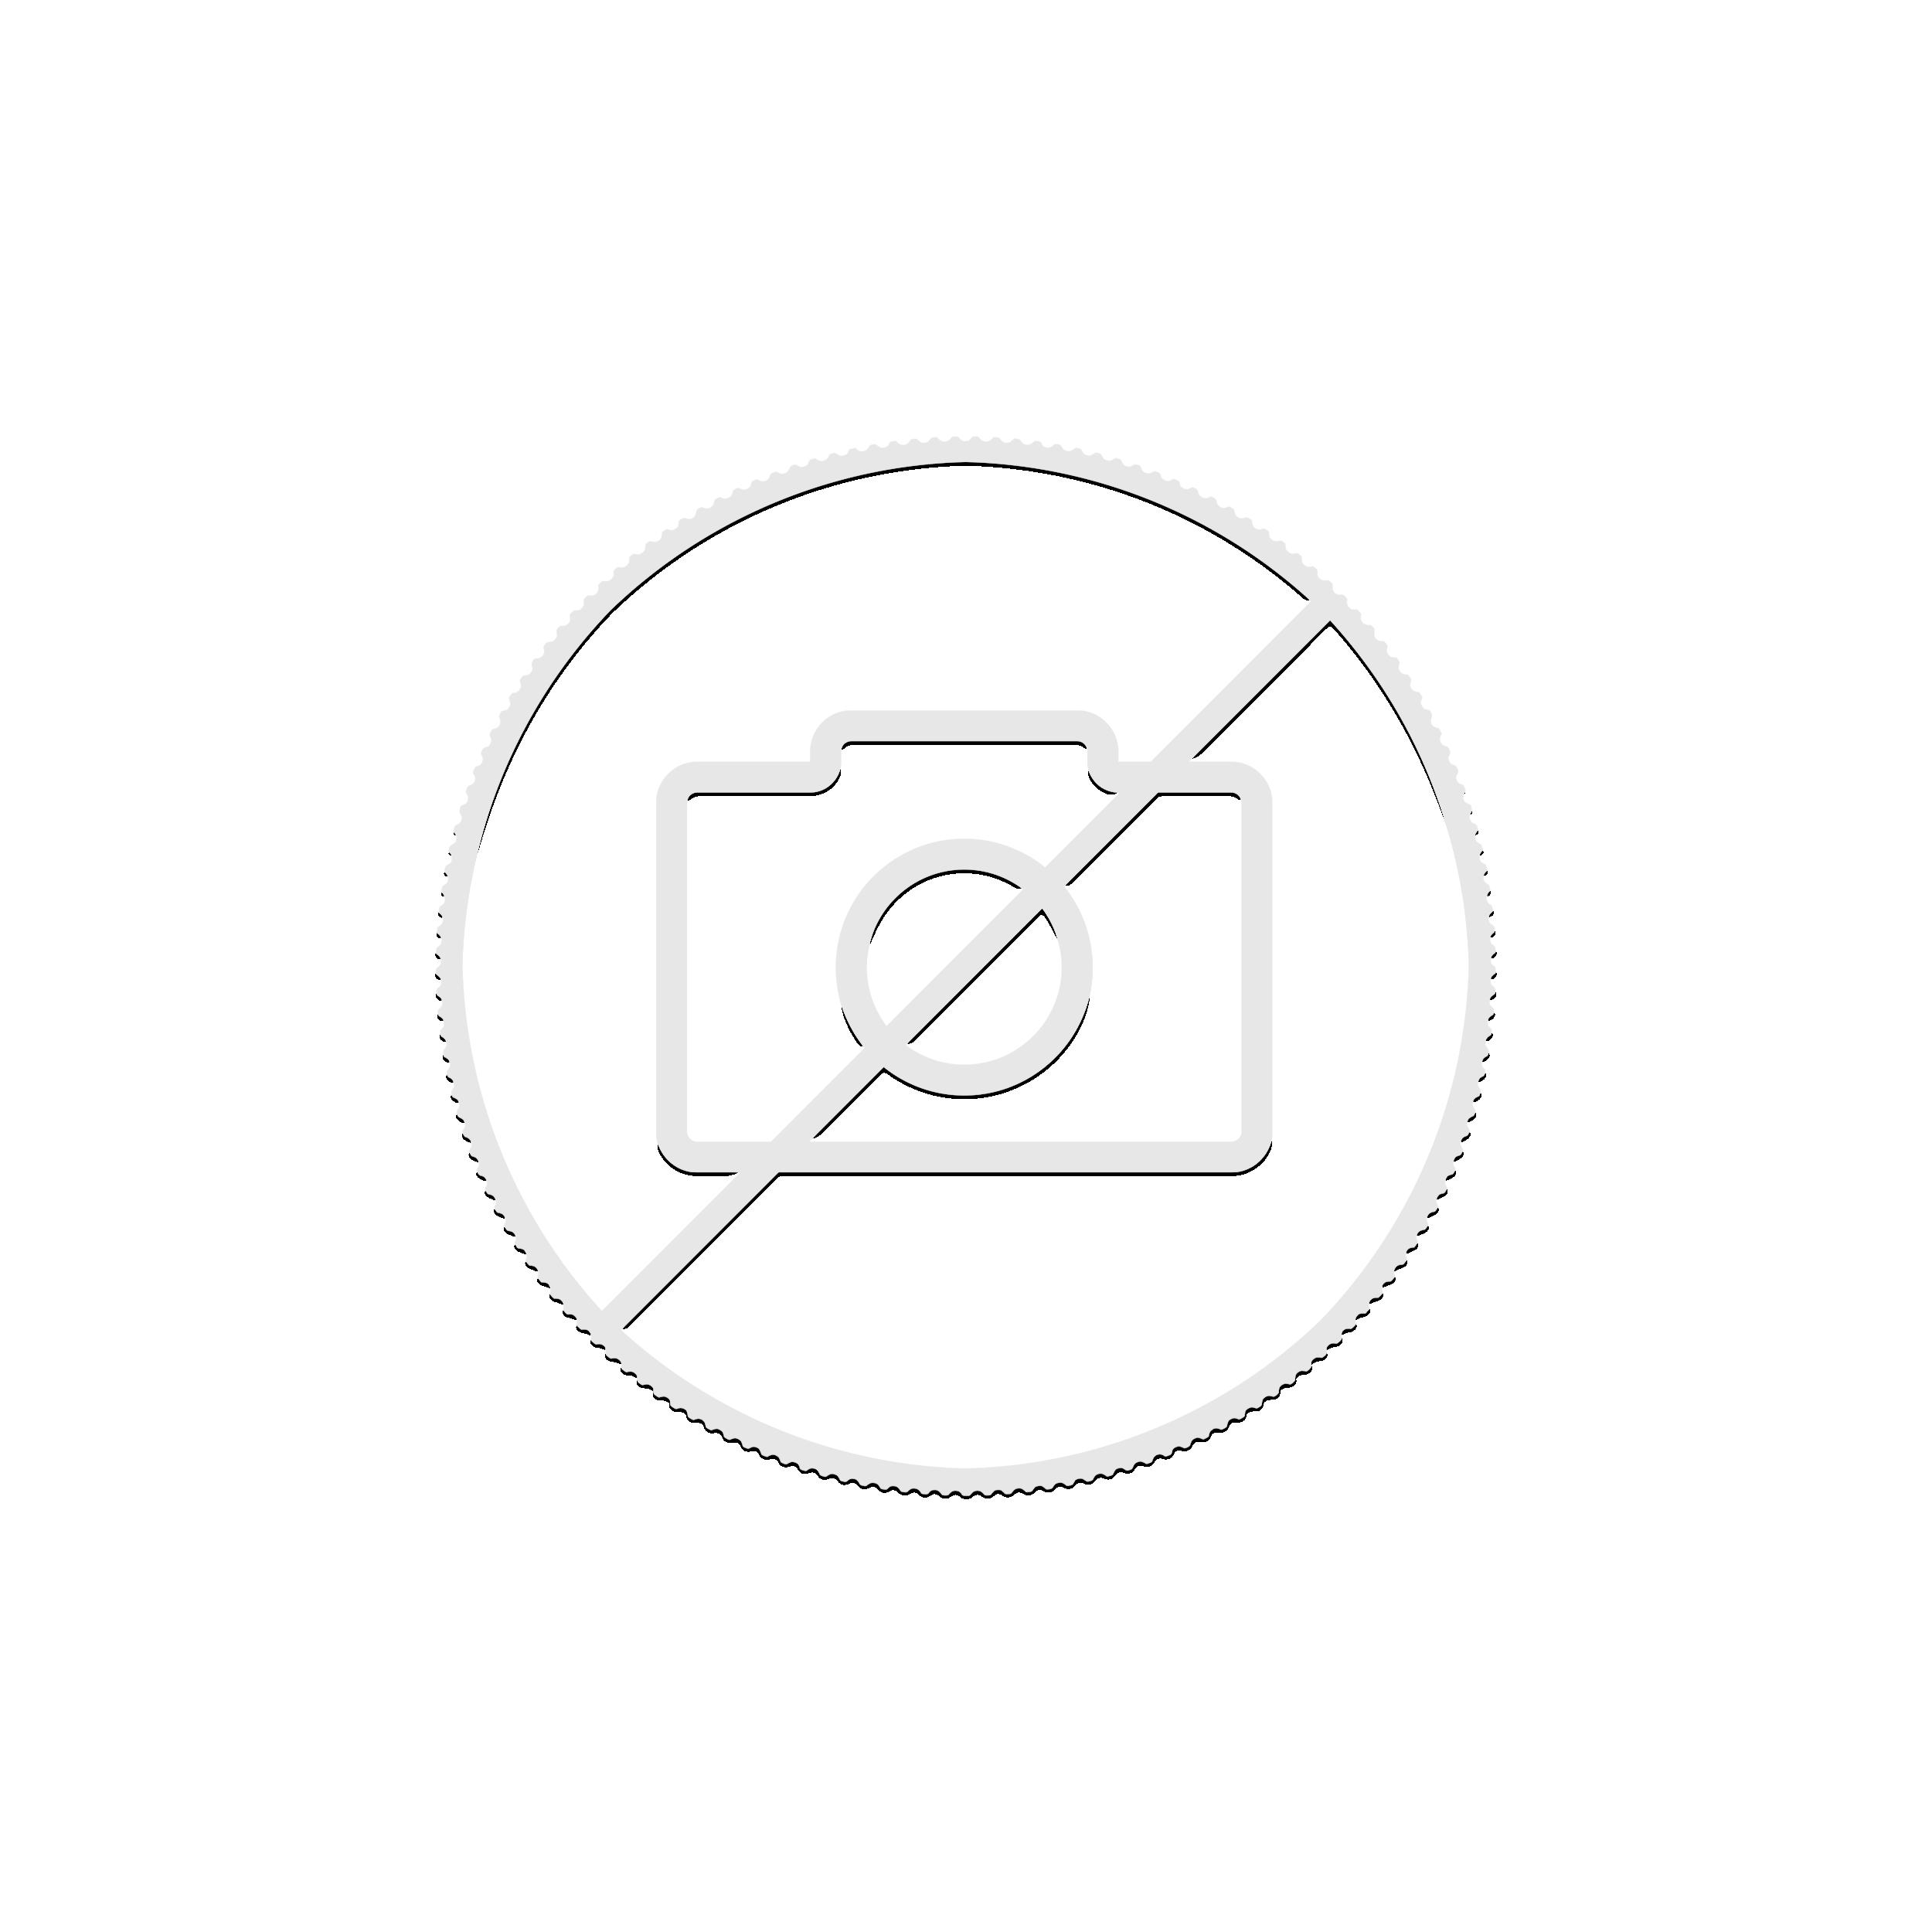 1 troy ounce zilveren munt Tree of Life 2020